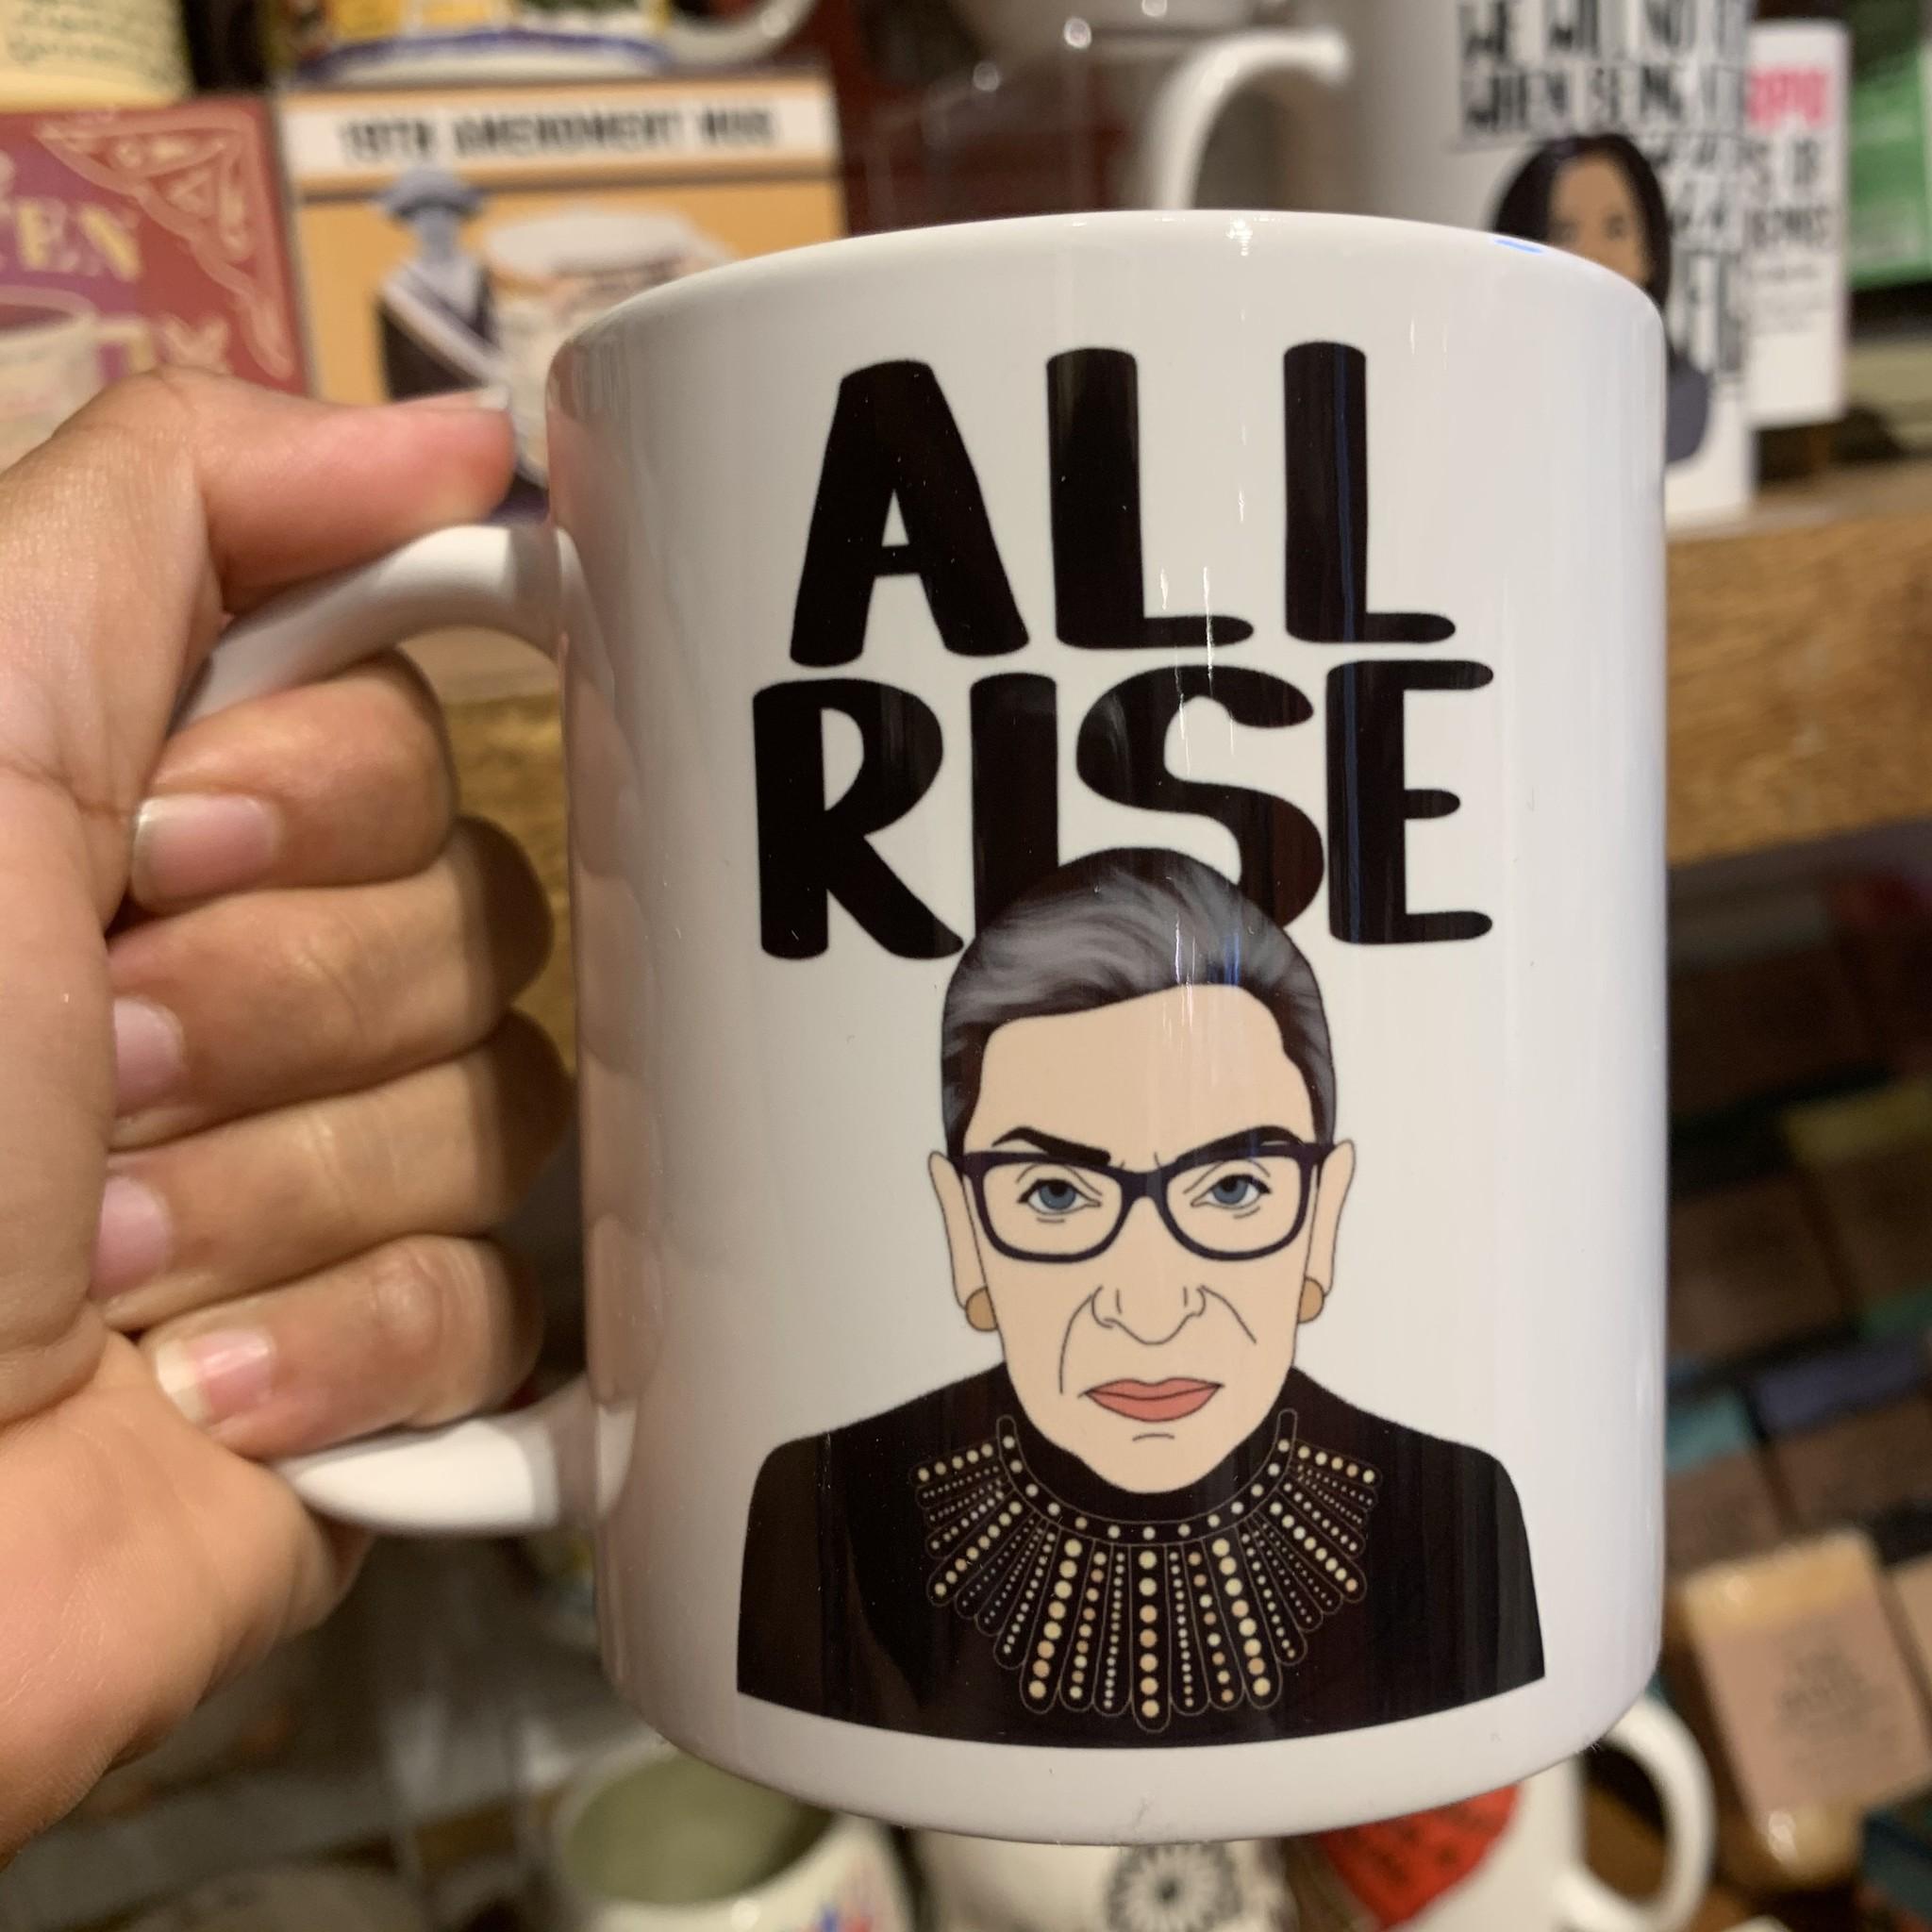 Citizen Ruth RBG All Rise Mug